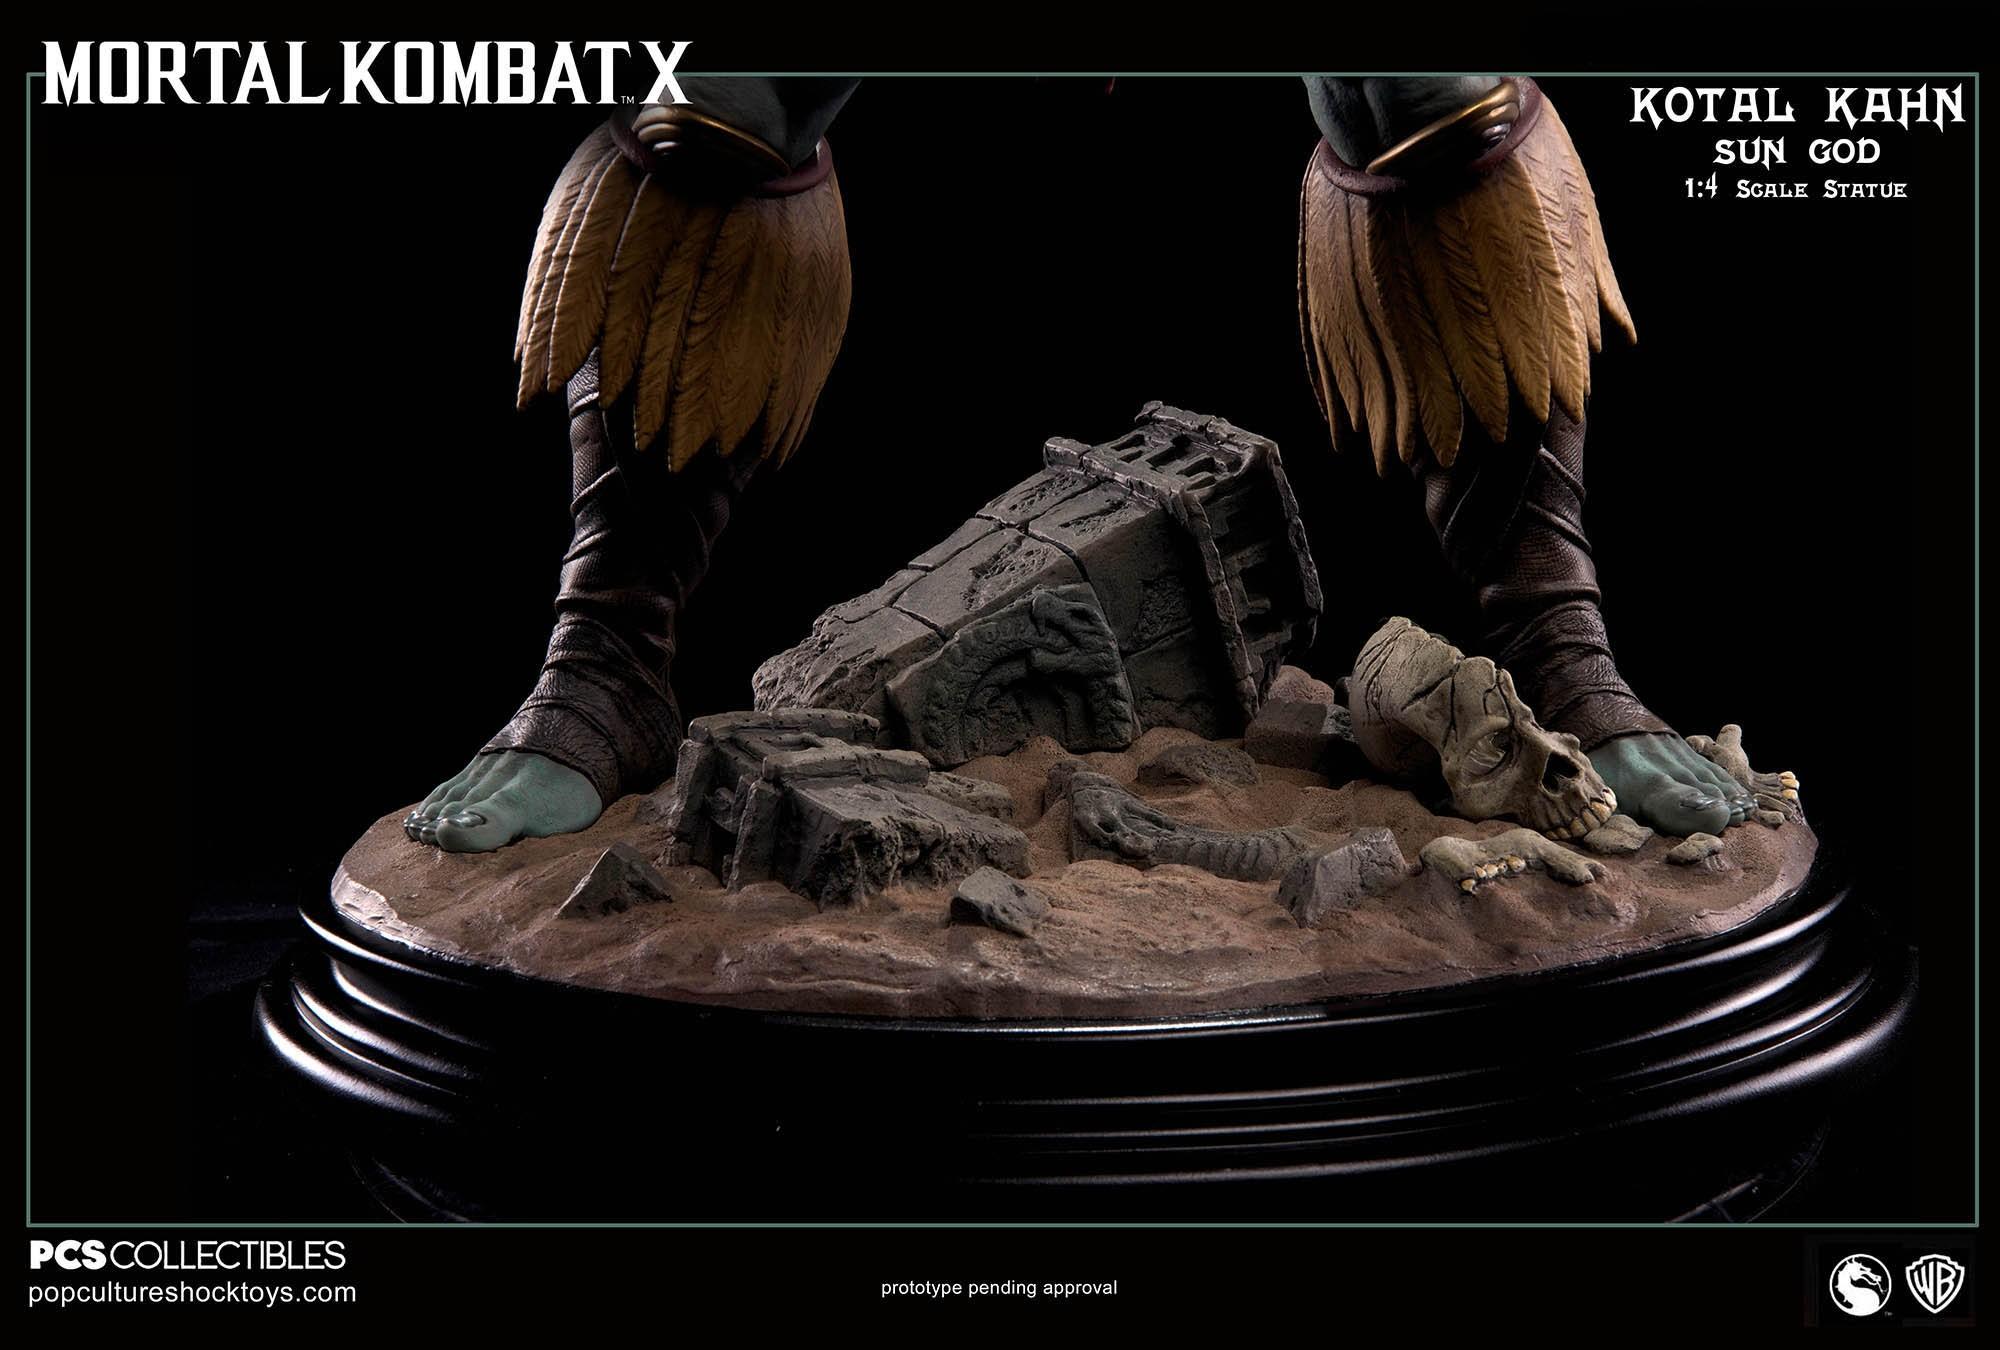 [Pop Culture Shock] Mortal Kombat X: Kotal Kahn 1:4 scale PCS-Kotal-Kahn-Sun-God-025